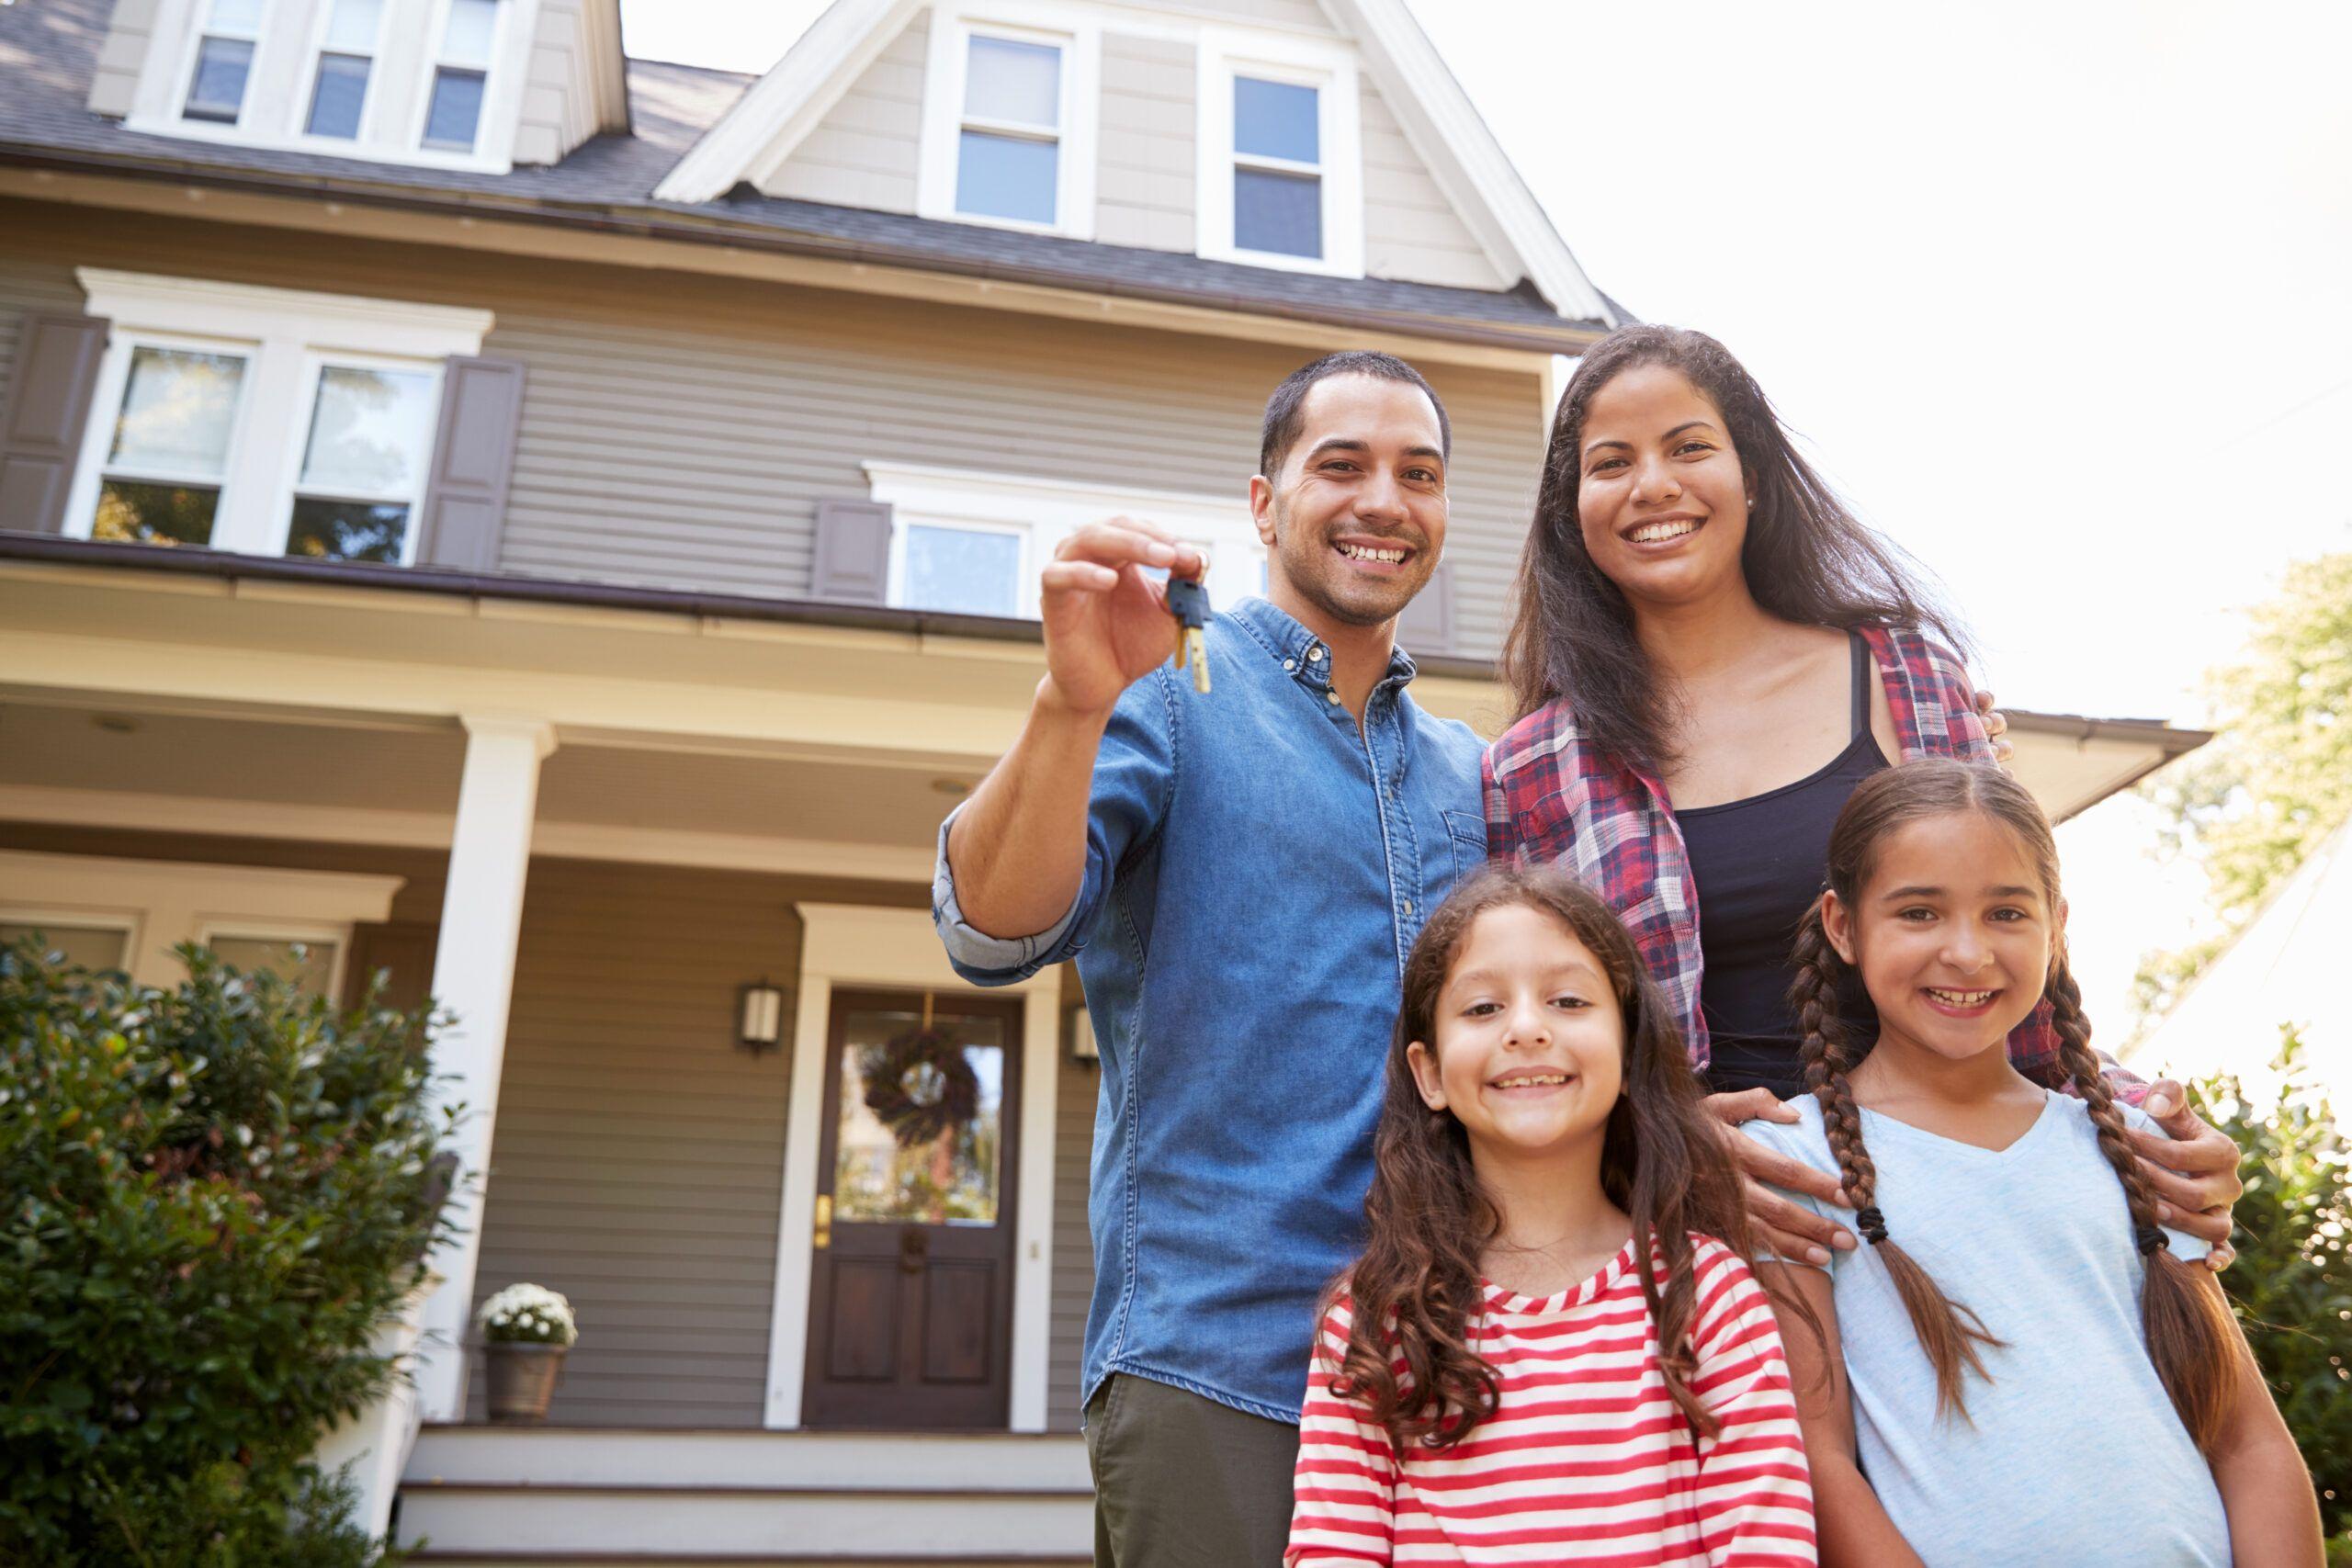 10 Tax Deduction Tips for Families | WalletGenius